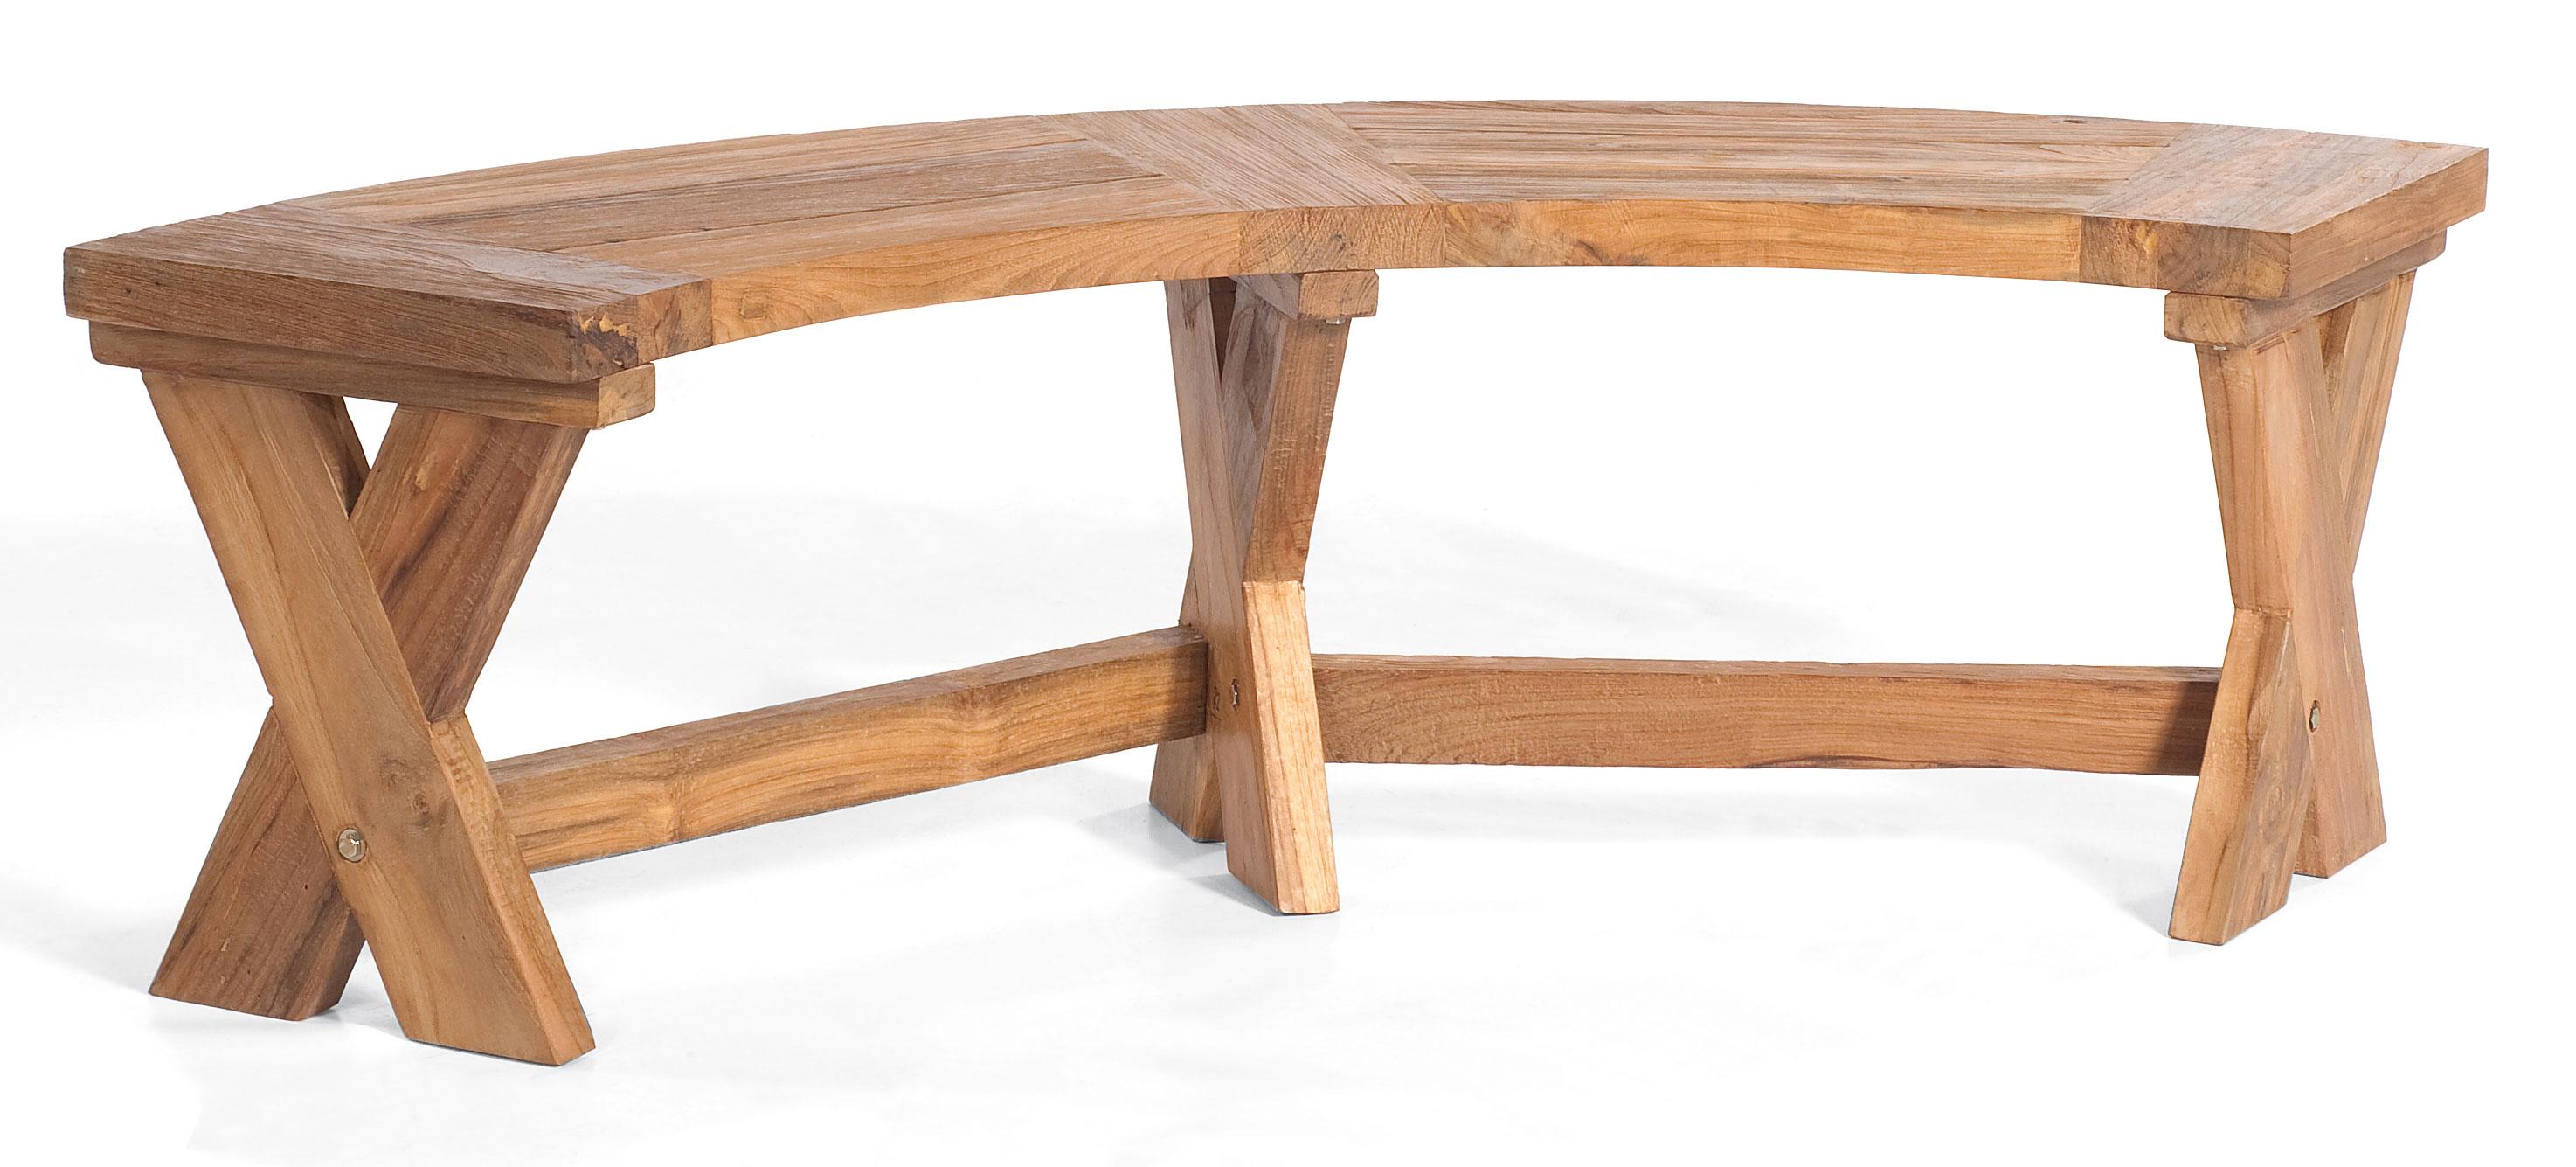 sonnenpartner gartenbank quantum old teak halbrund bei. Black Bedroom Furniture Sets. Home Design Ideas